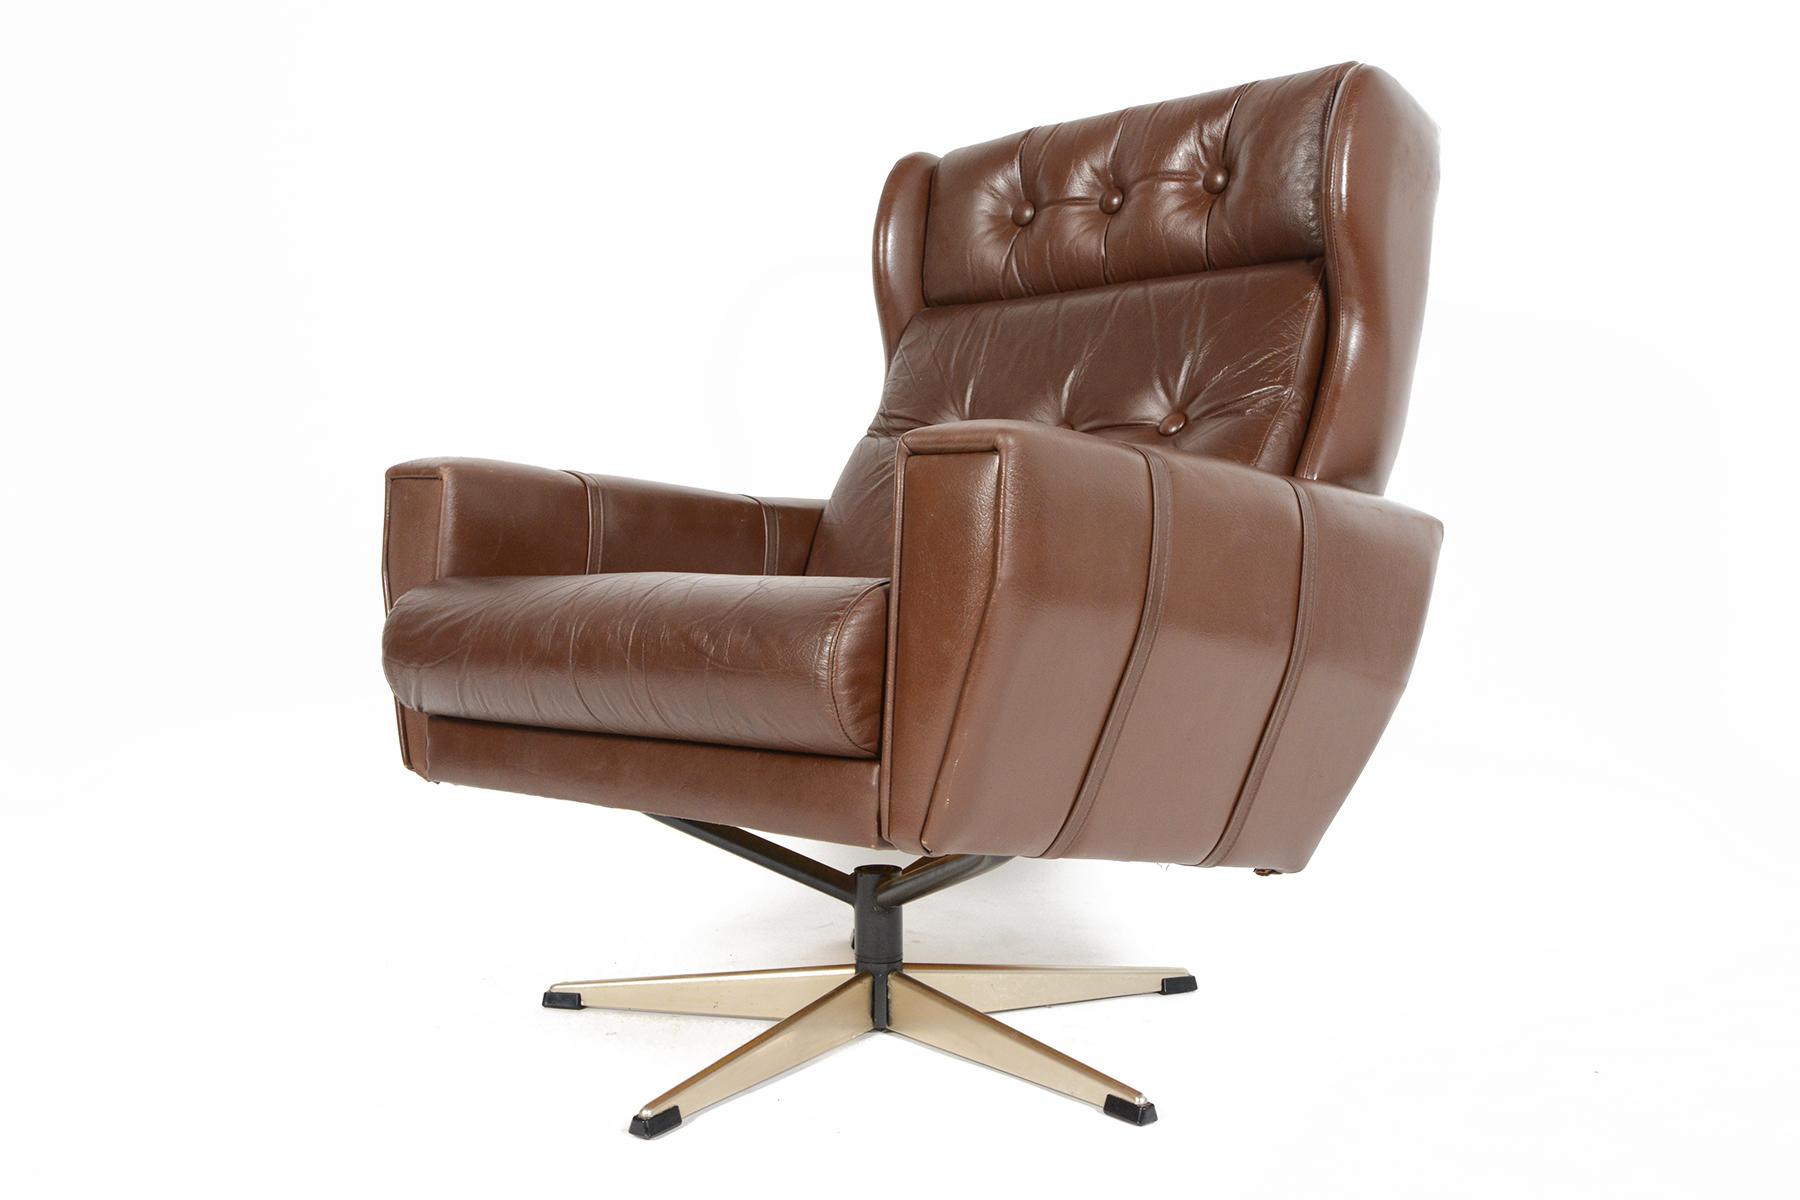 high back brown leather swivel lounge chair chairish